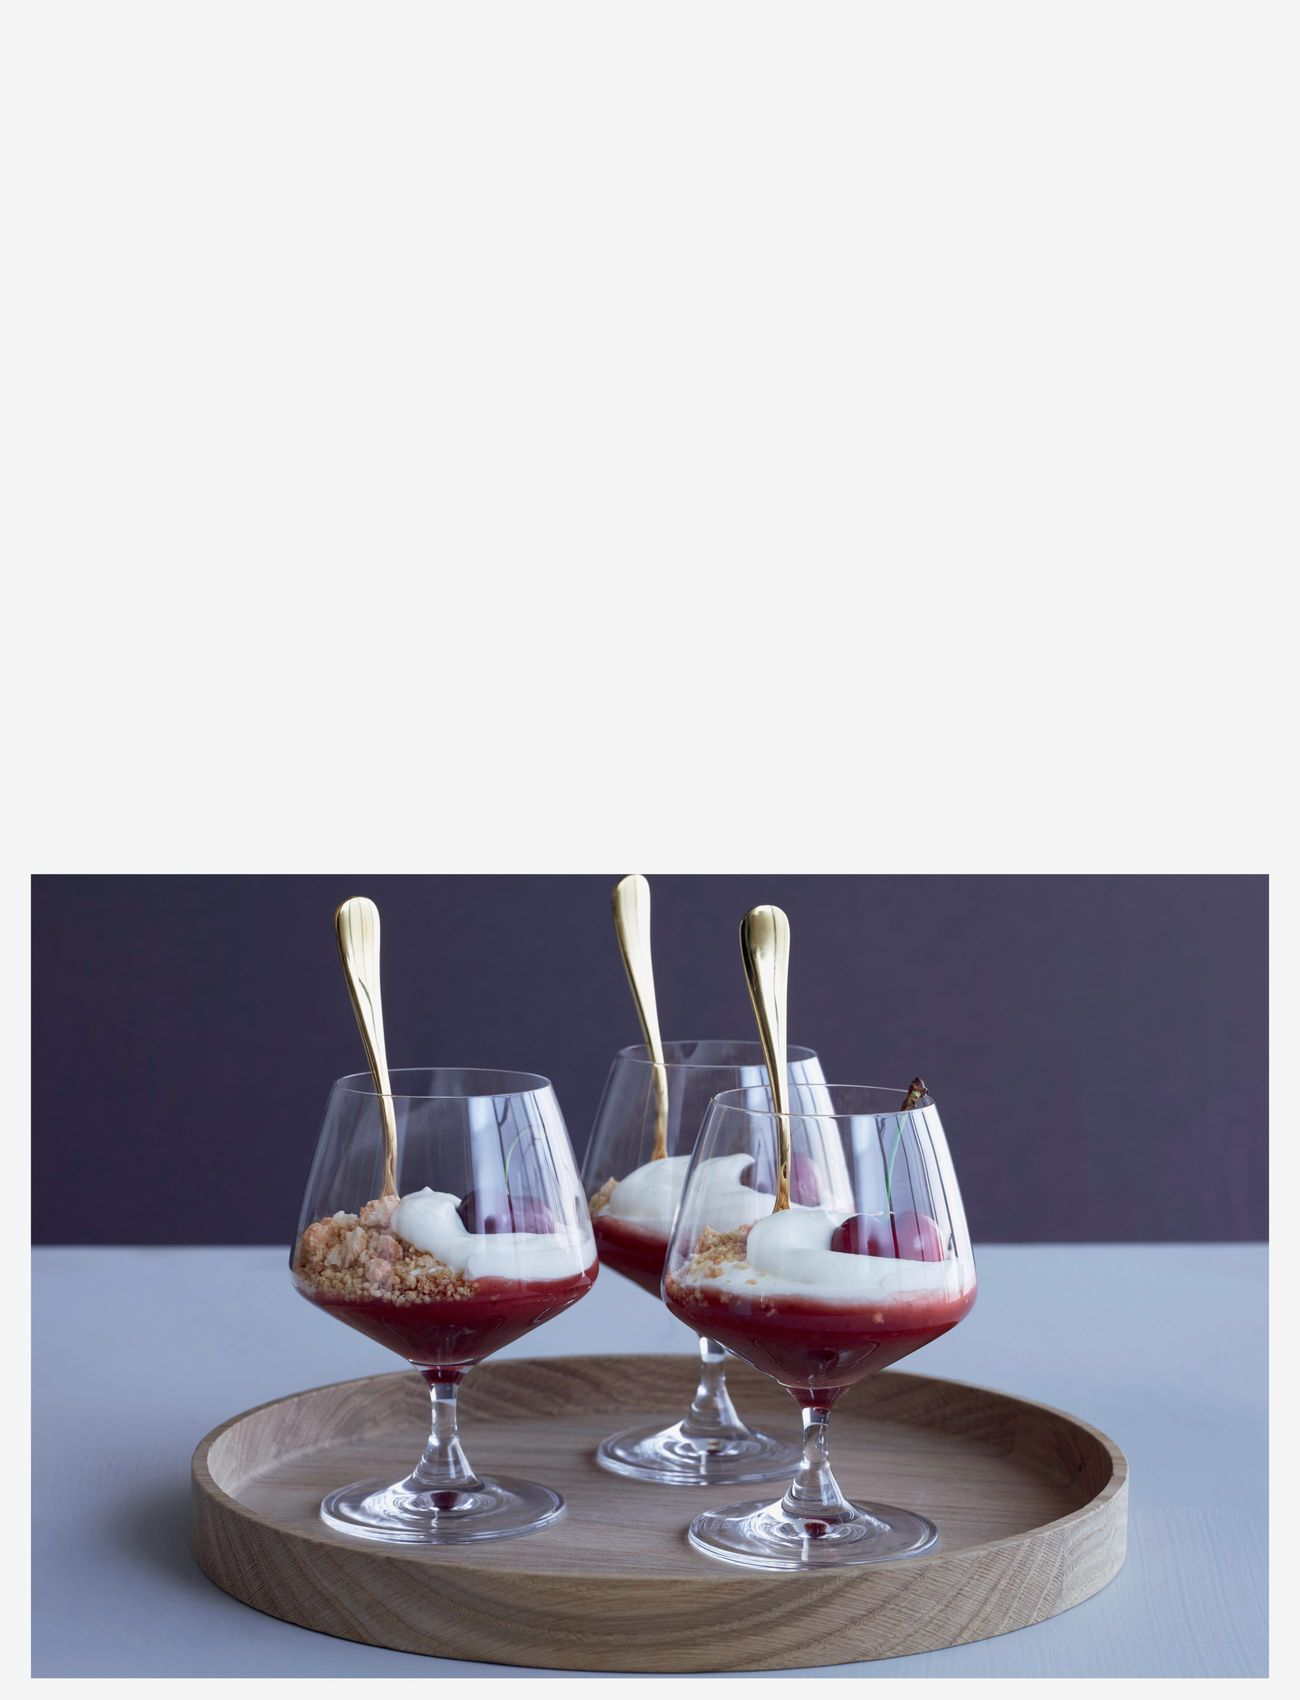 Holmegaard - Perfection Cognacglass 36 cl 6 stk. - whiskyglass & cognacglass - clear - 1